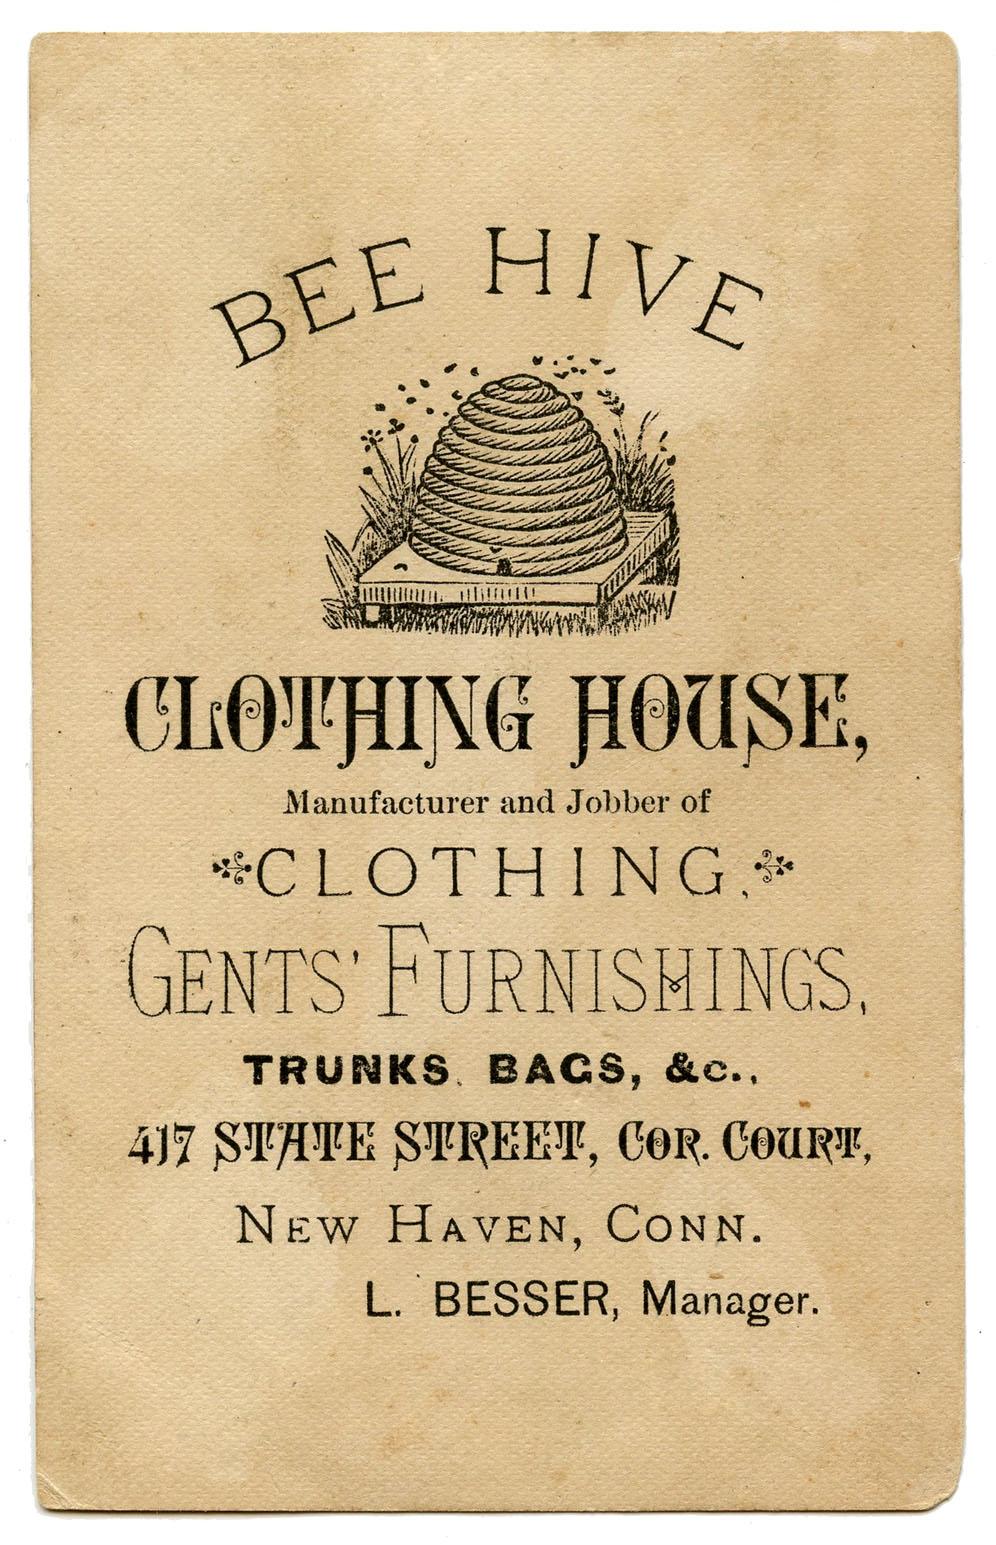 Vintage Advertising Ephemera Bee Hive Clothing The